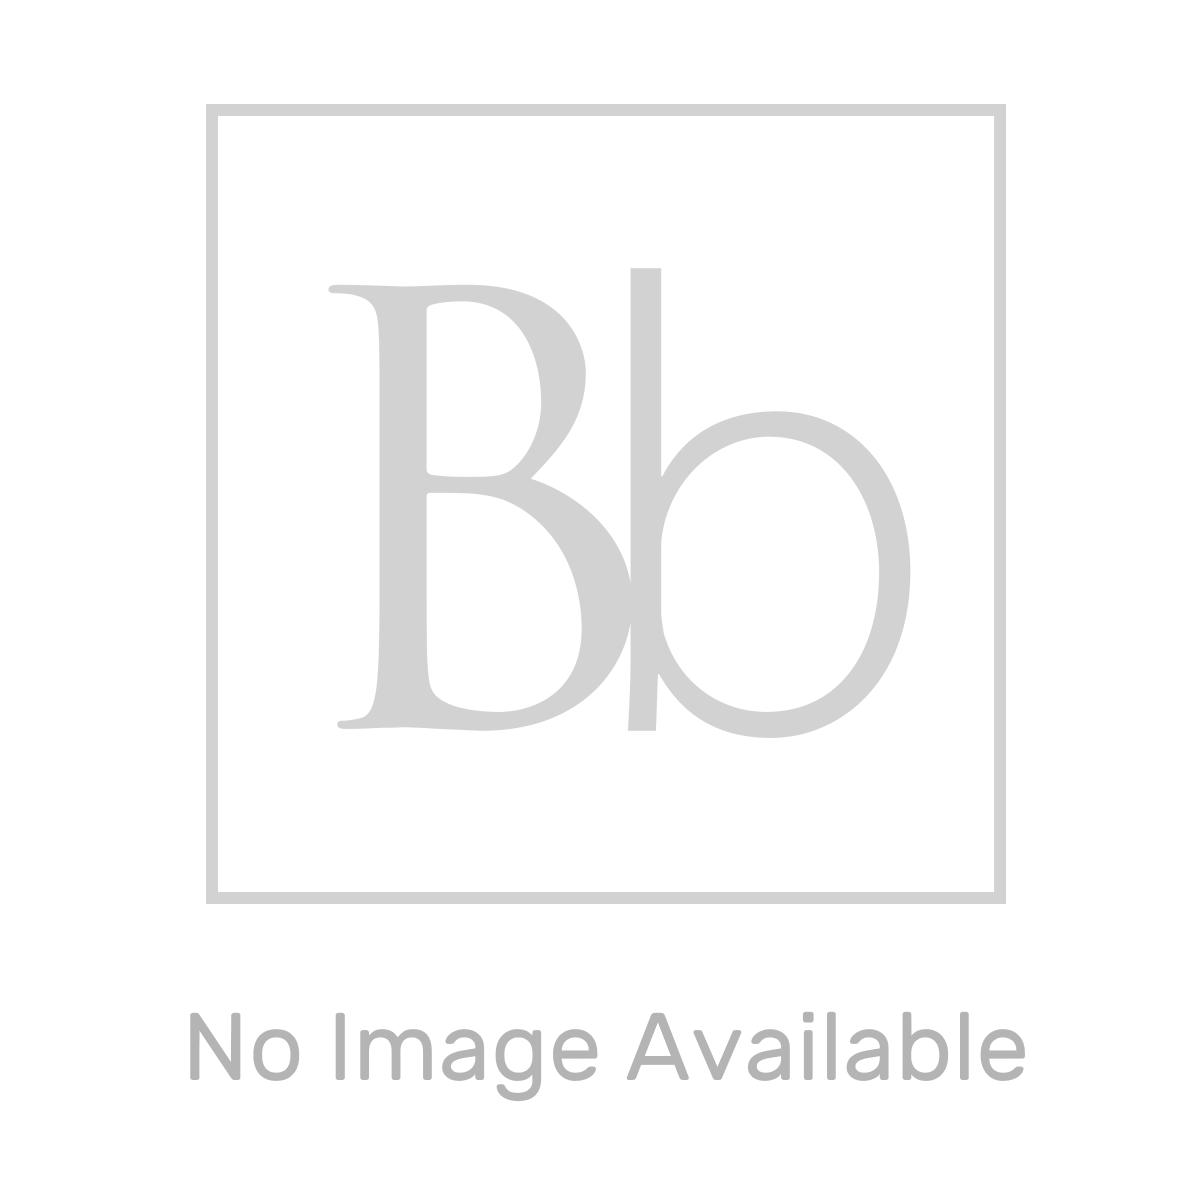 RAK Surface Cool Grey Rustic Tile 600 x 600mm Lifestyle